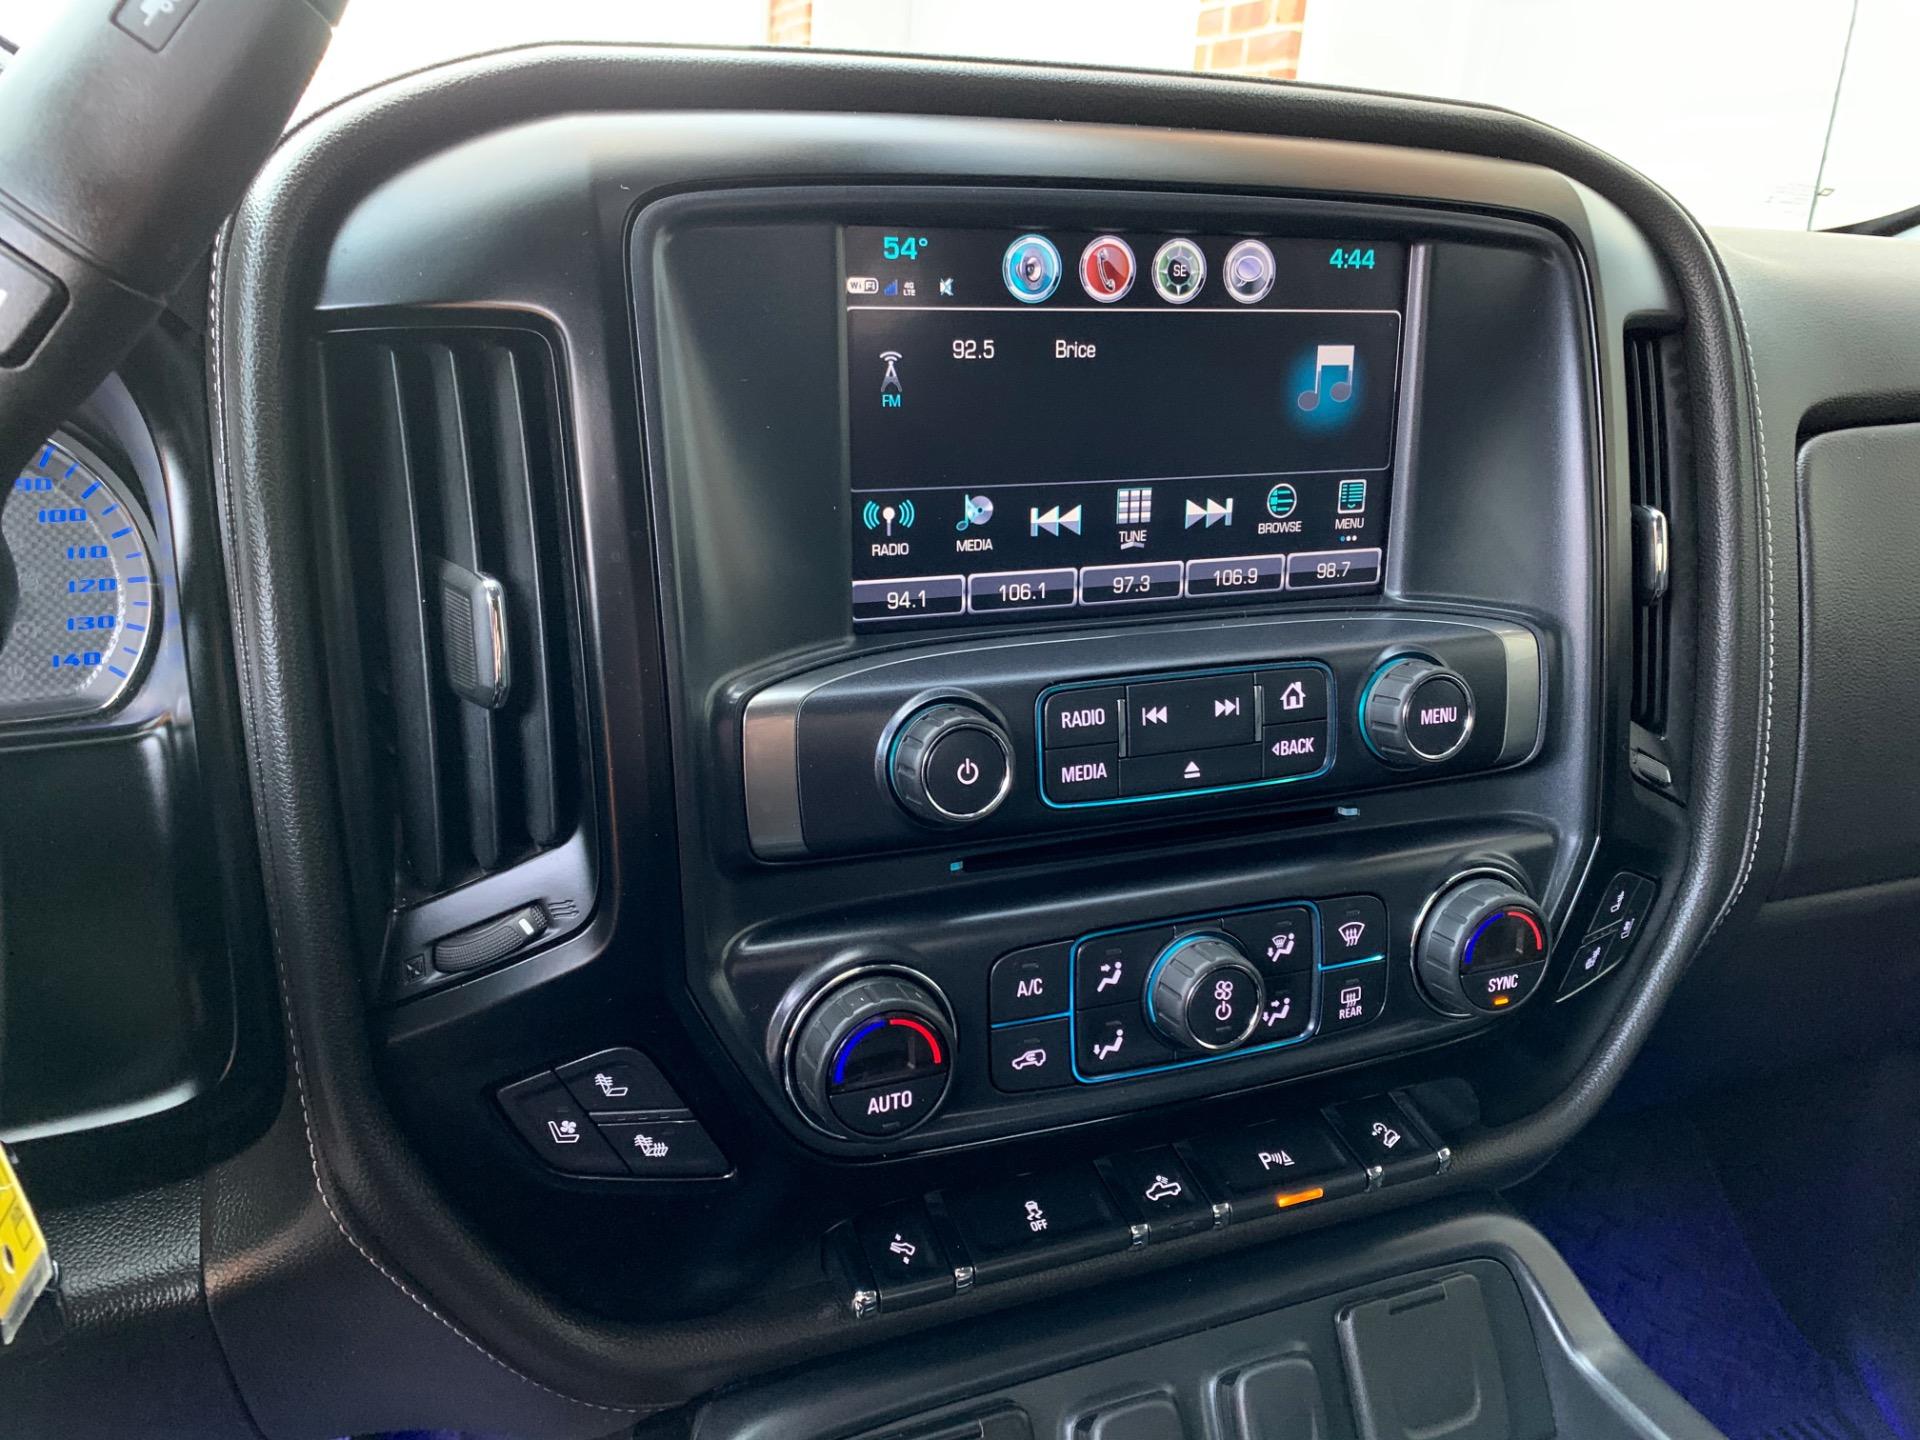 Used-2017-Chevrolet-Silverado-1500-SCA-G2---LTZ-Z71